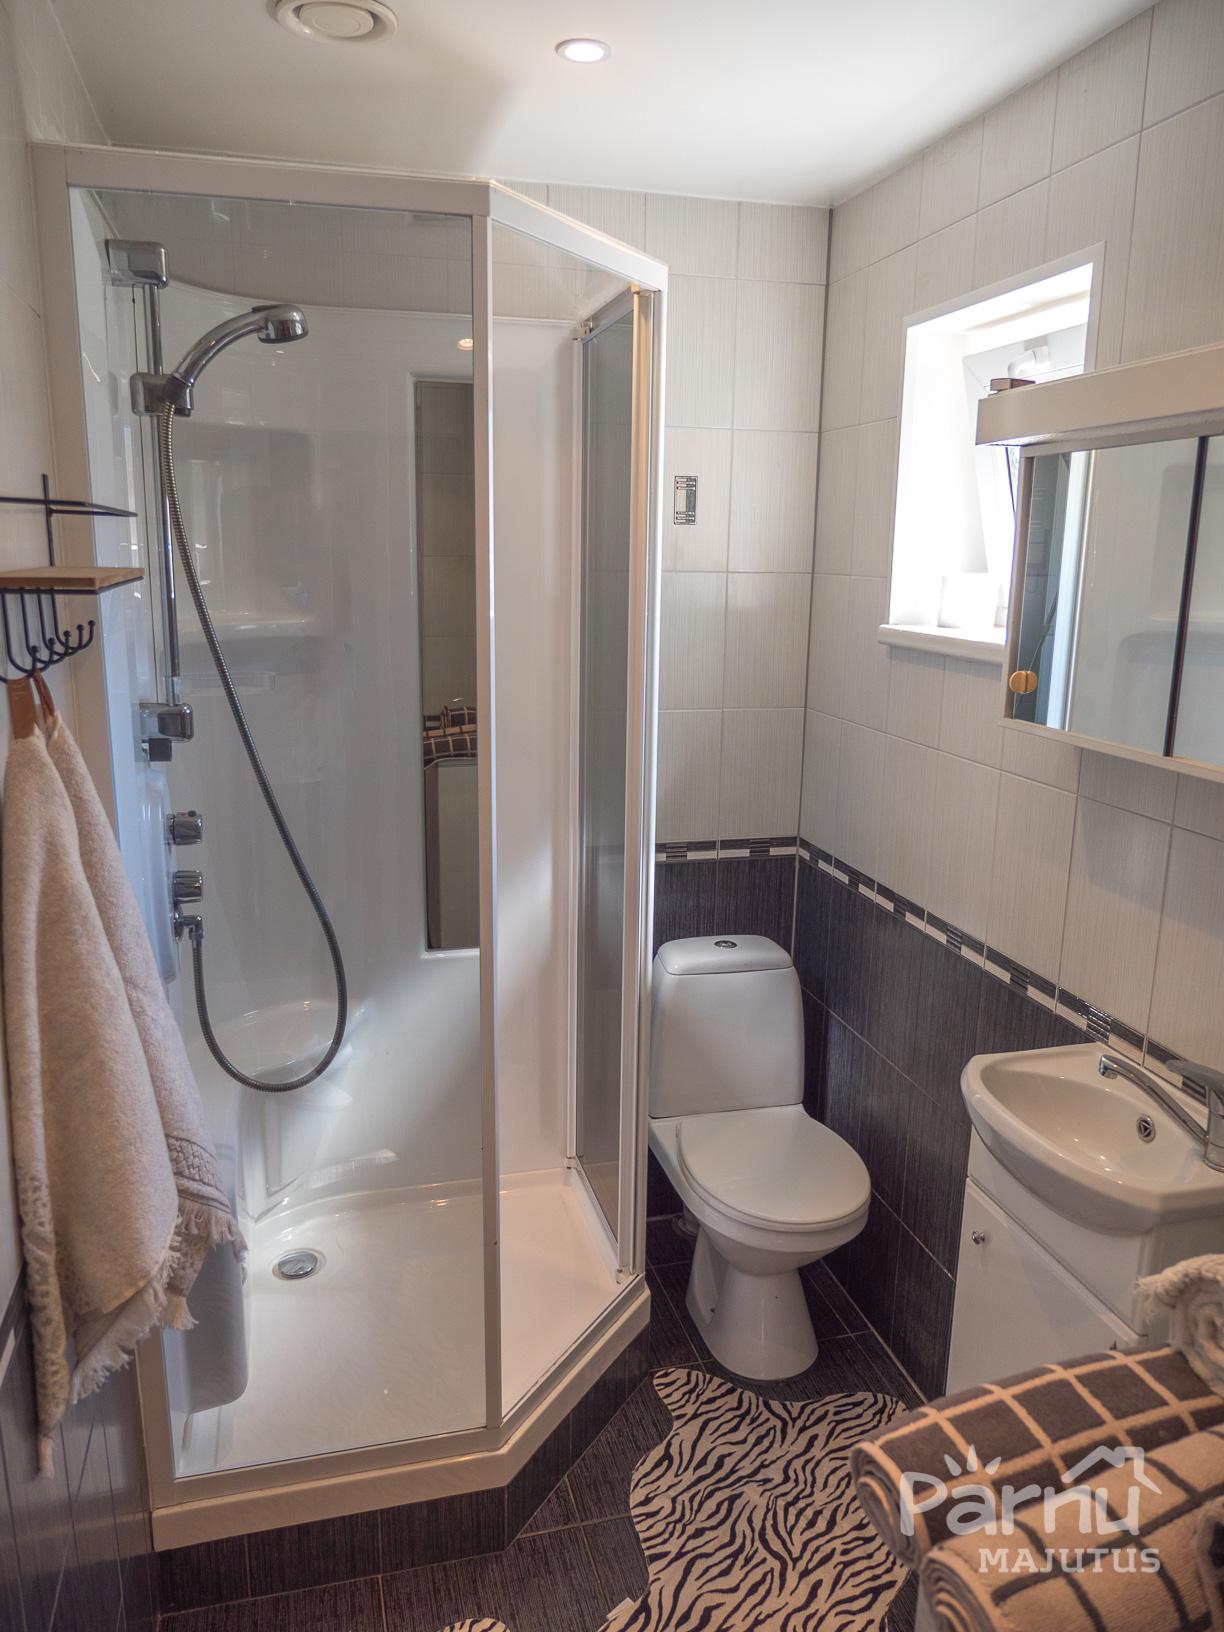 Cozy apartment for 4 in the city center of Pärnu